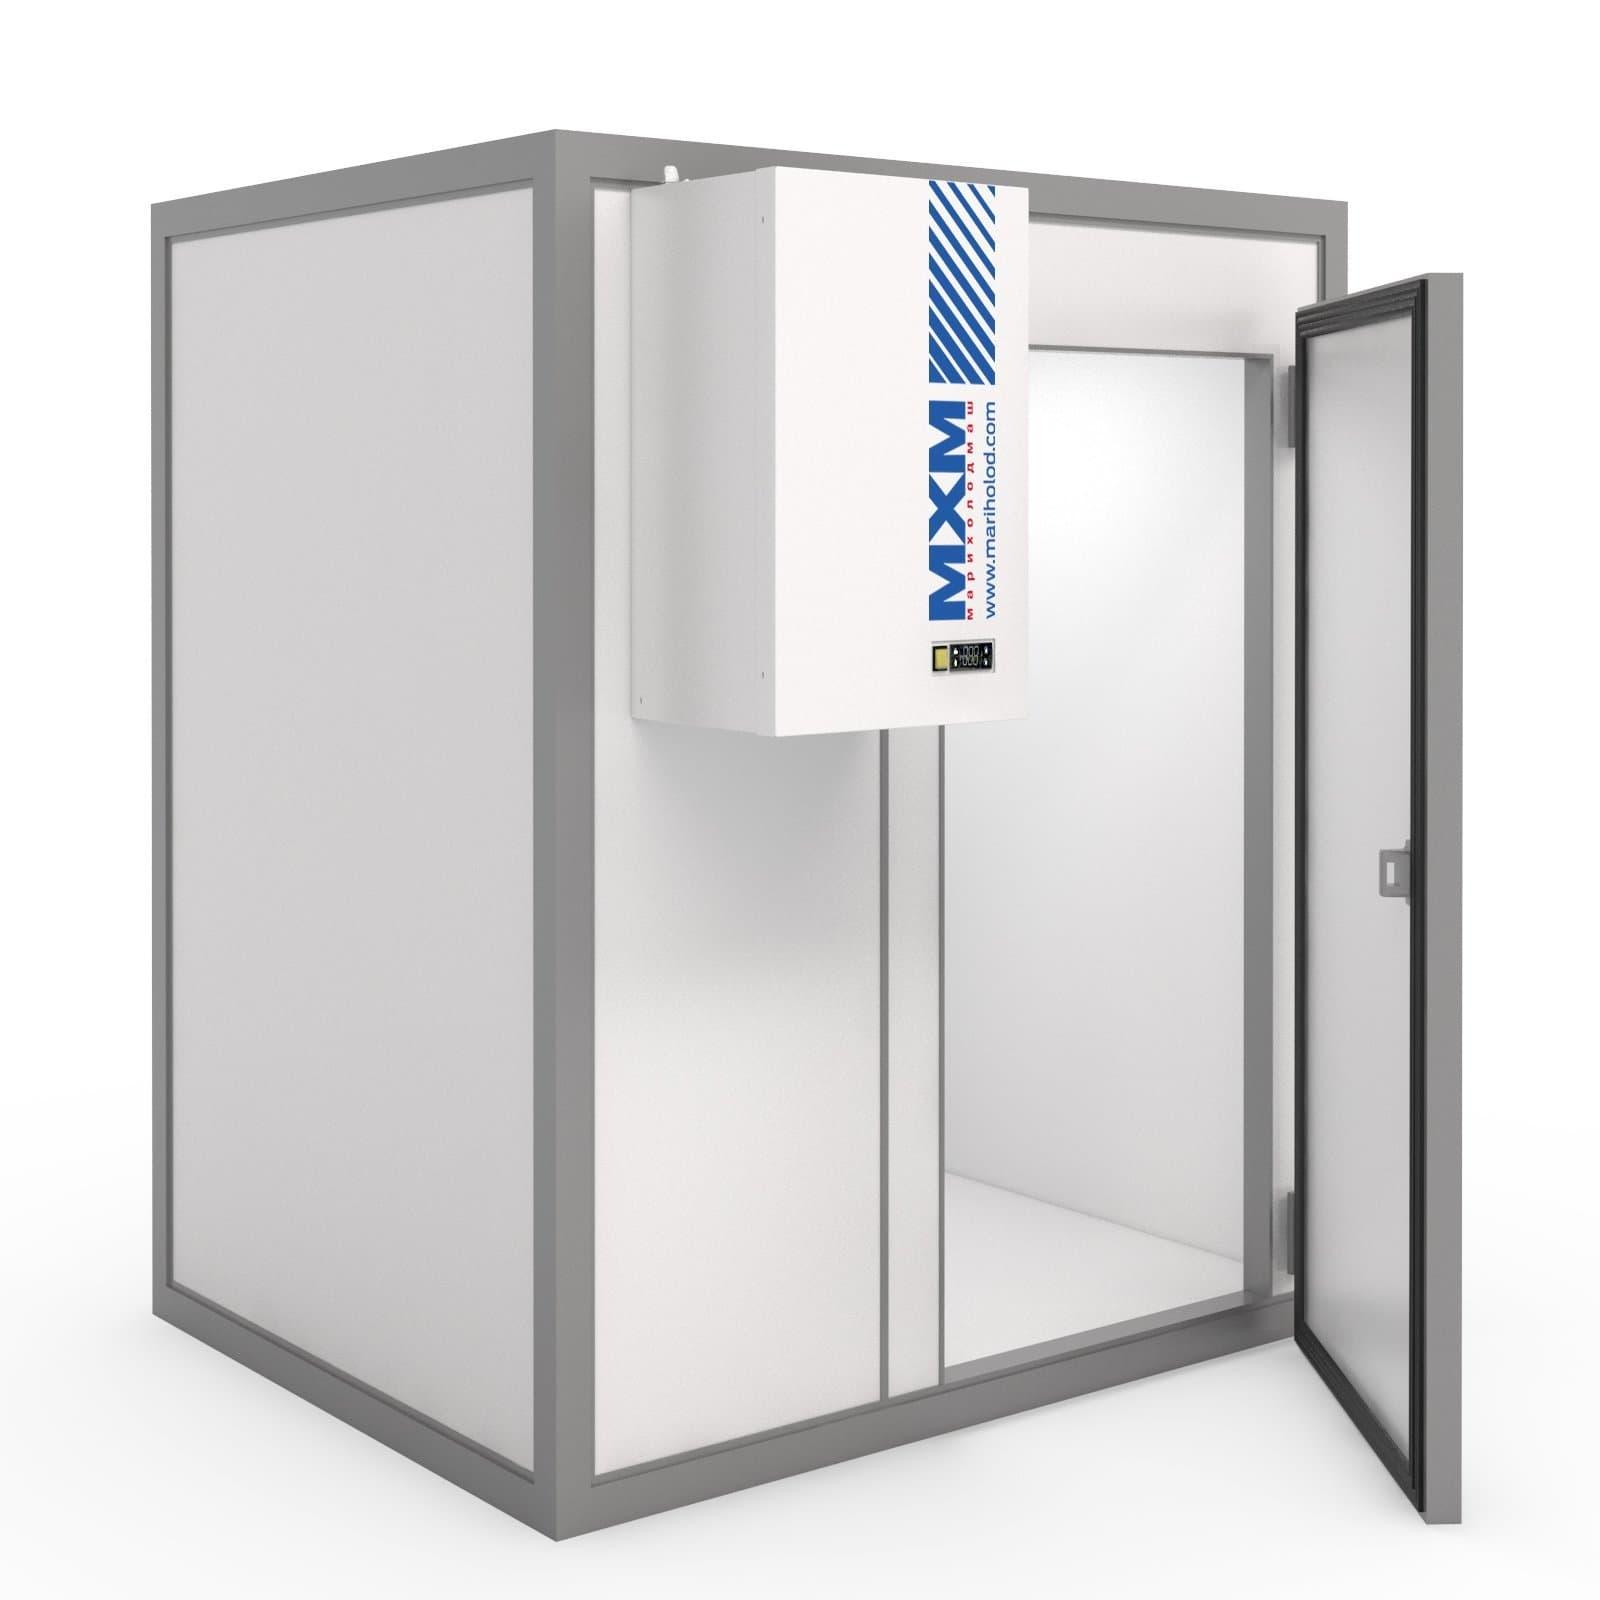 Камера холодильная МХМ КХН-29,49 2560×4960×2720